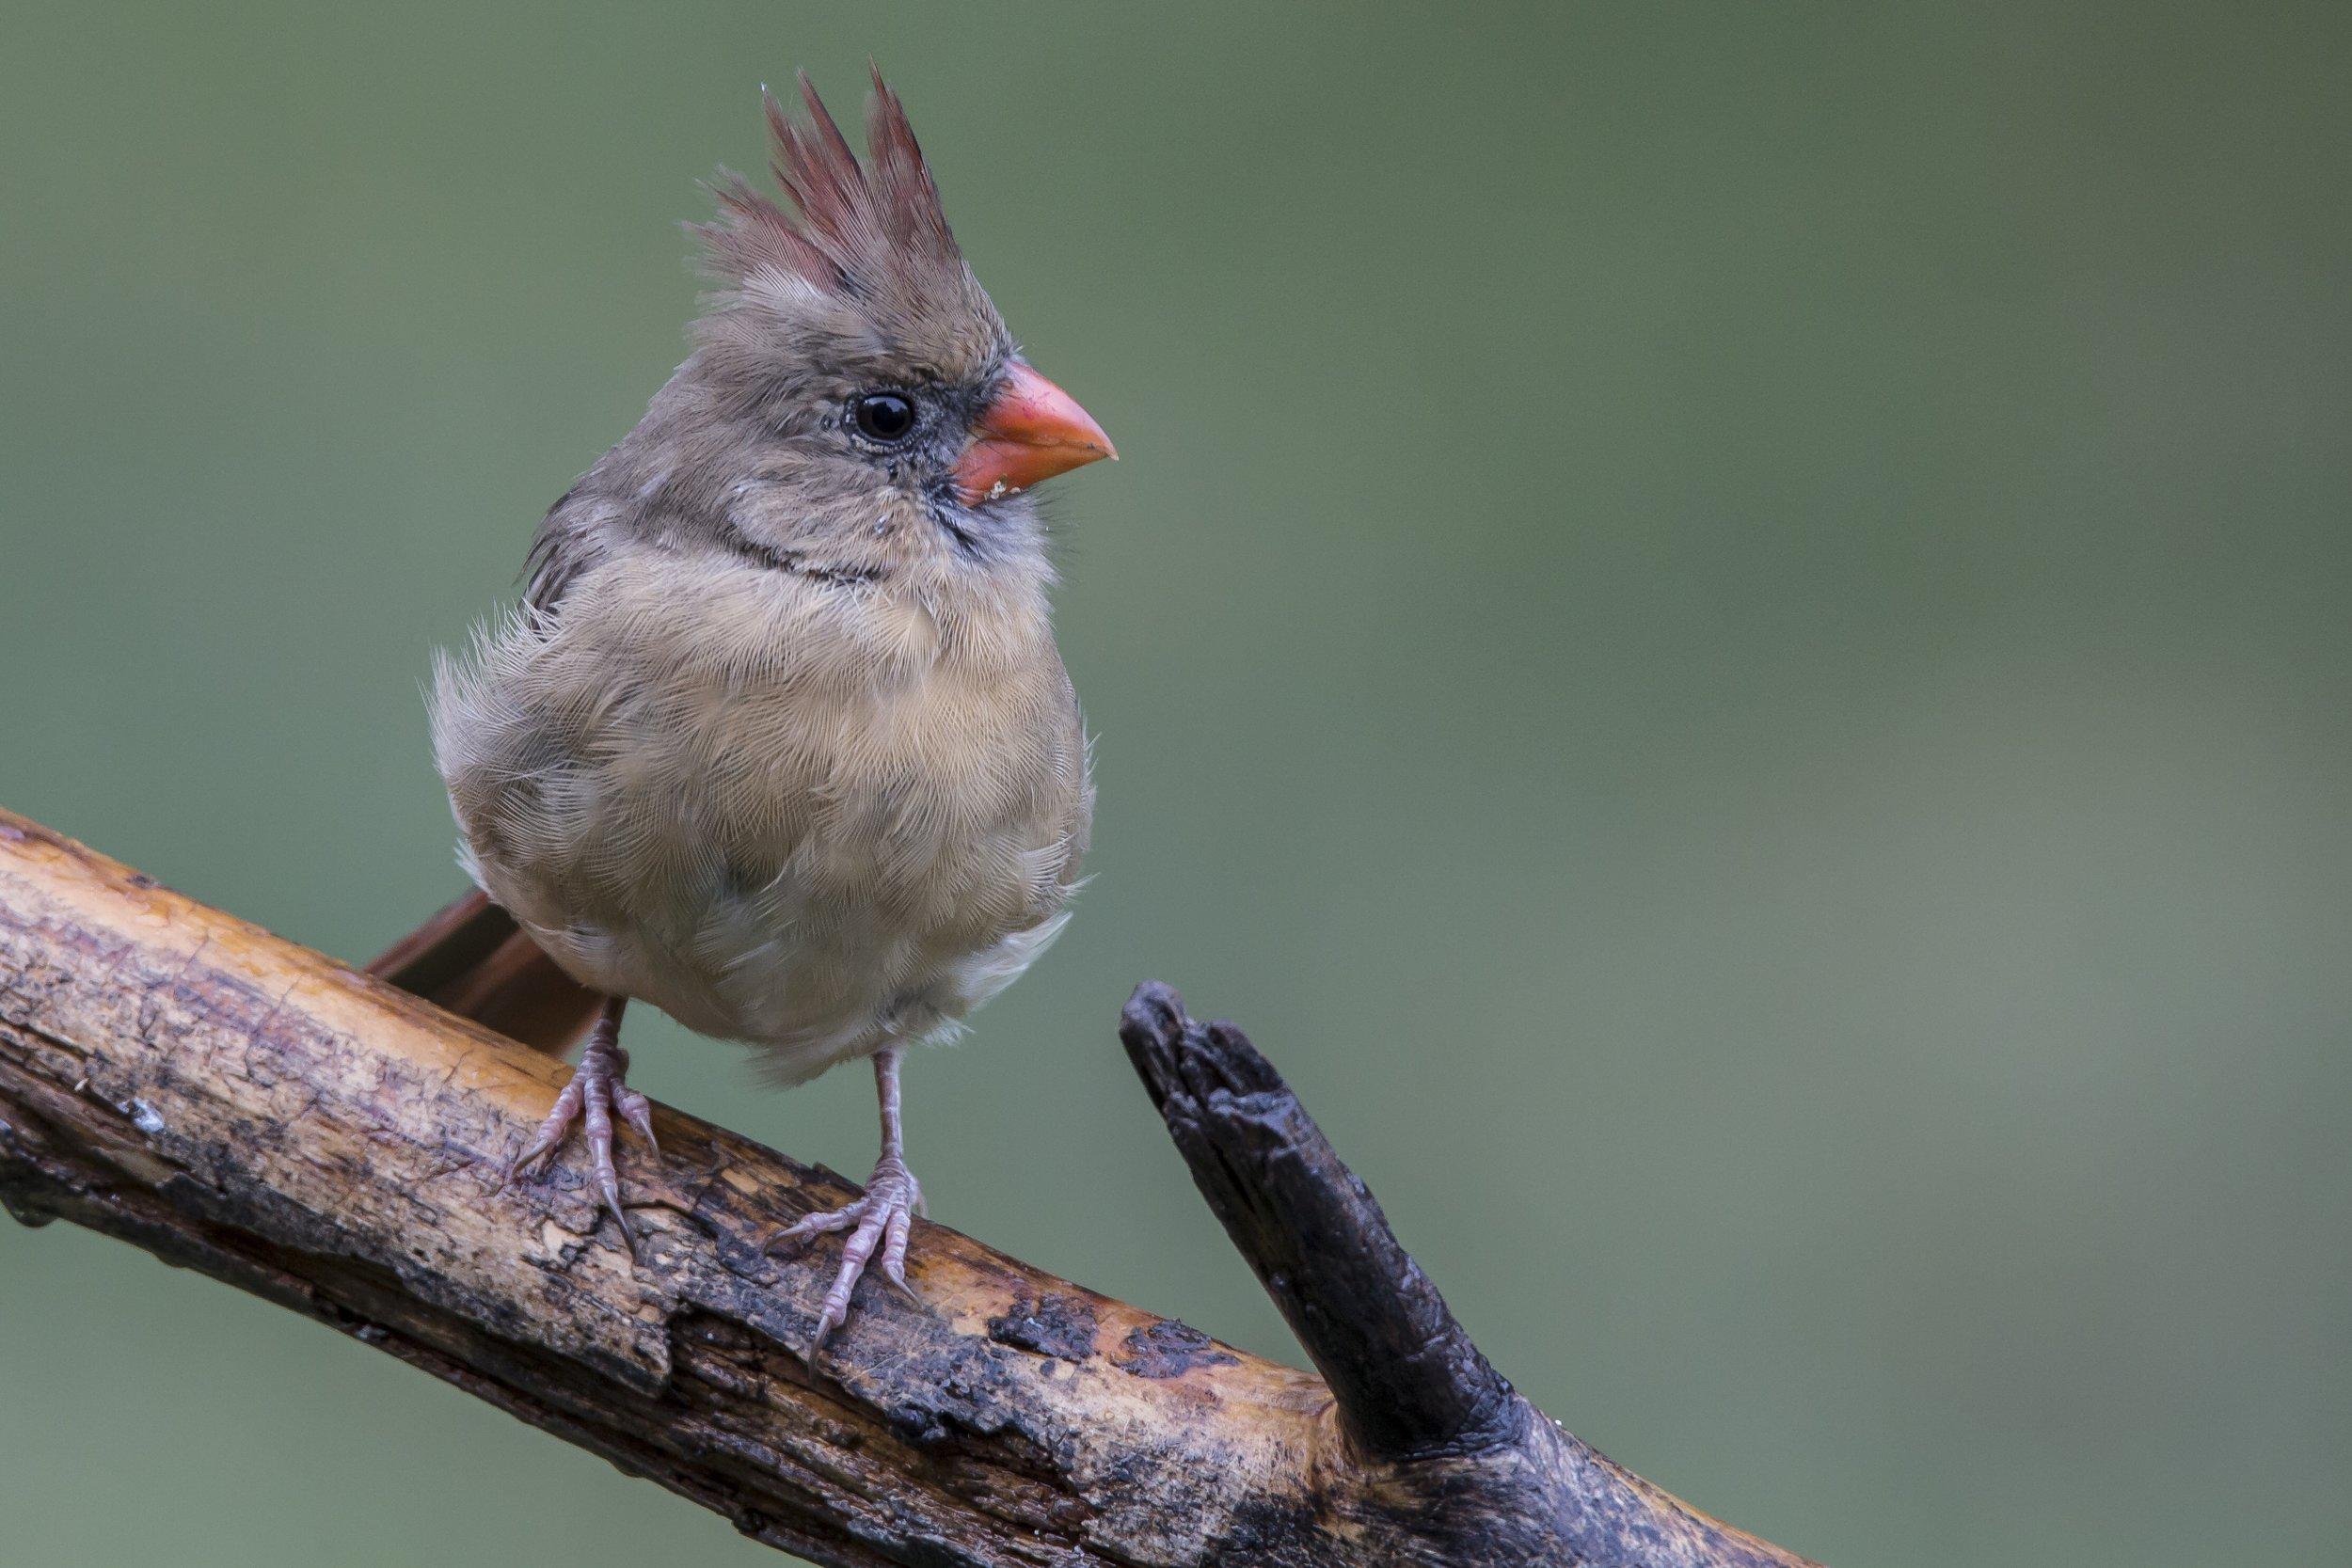 Femal Northern Cardinal.